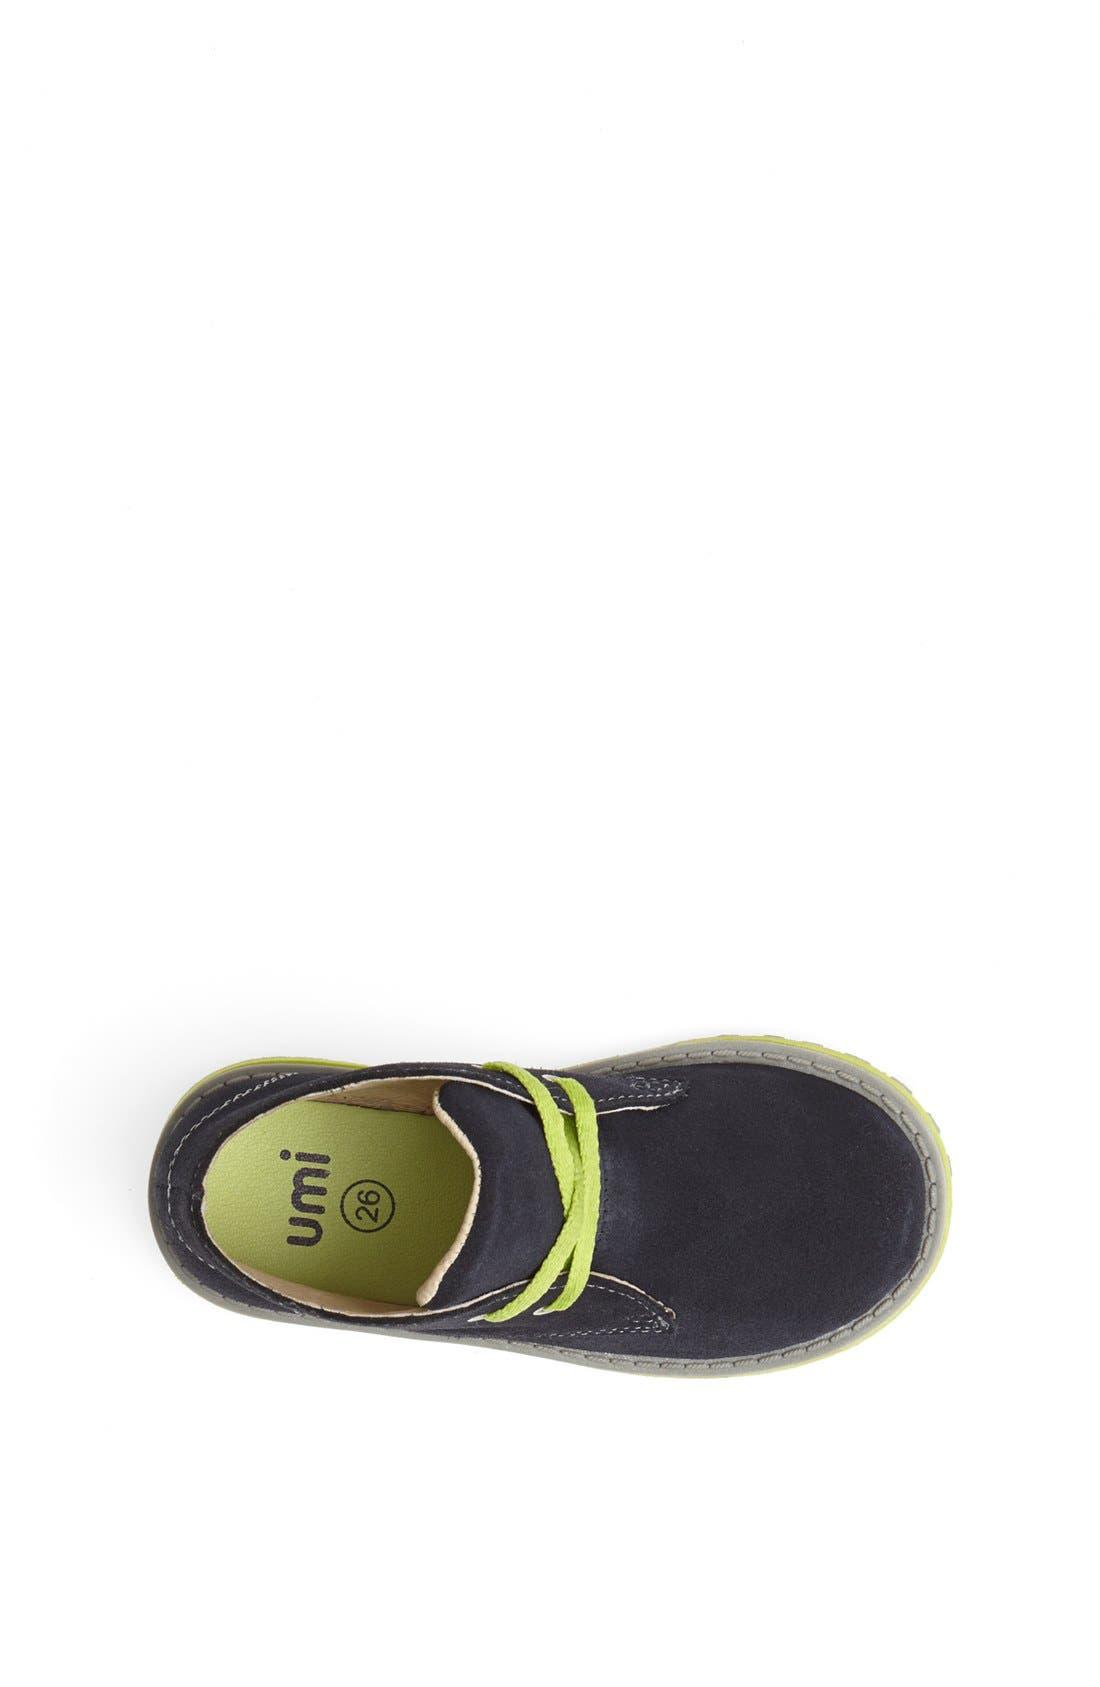 Alternate Image 3  - Umi 'Hector' Boot (Toddler & Little Kid)